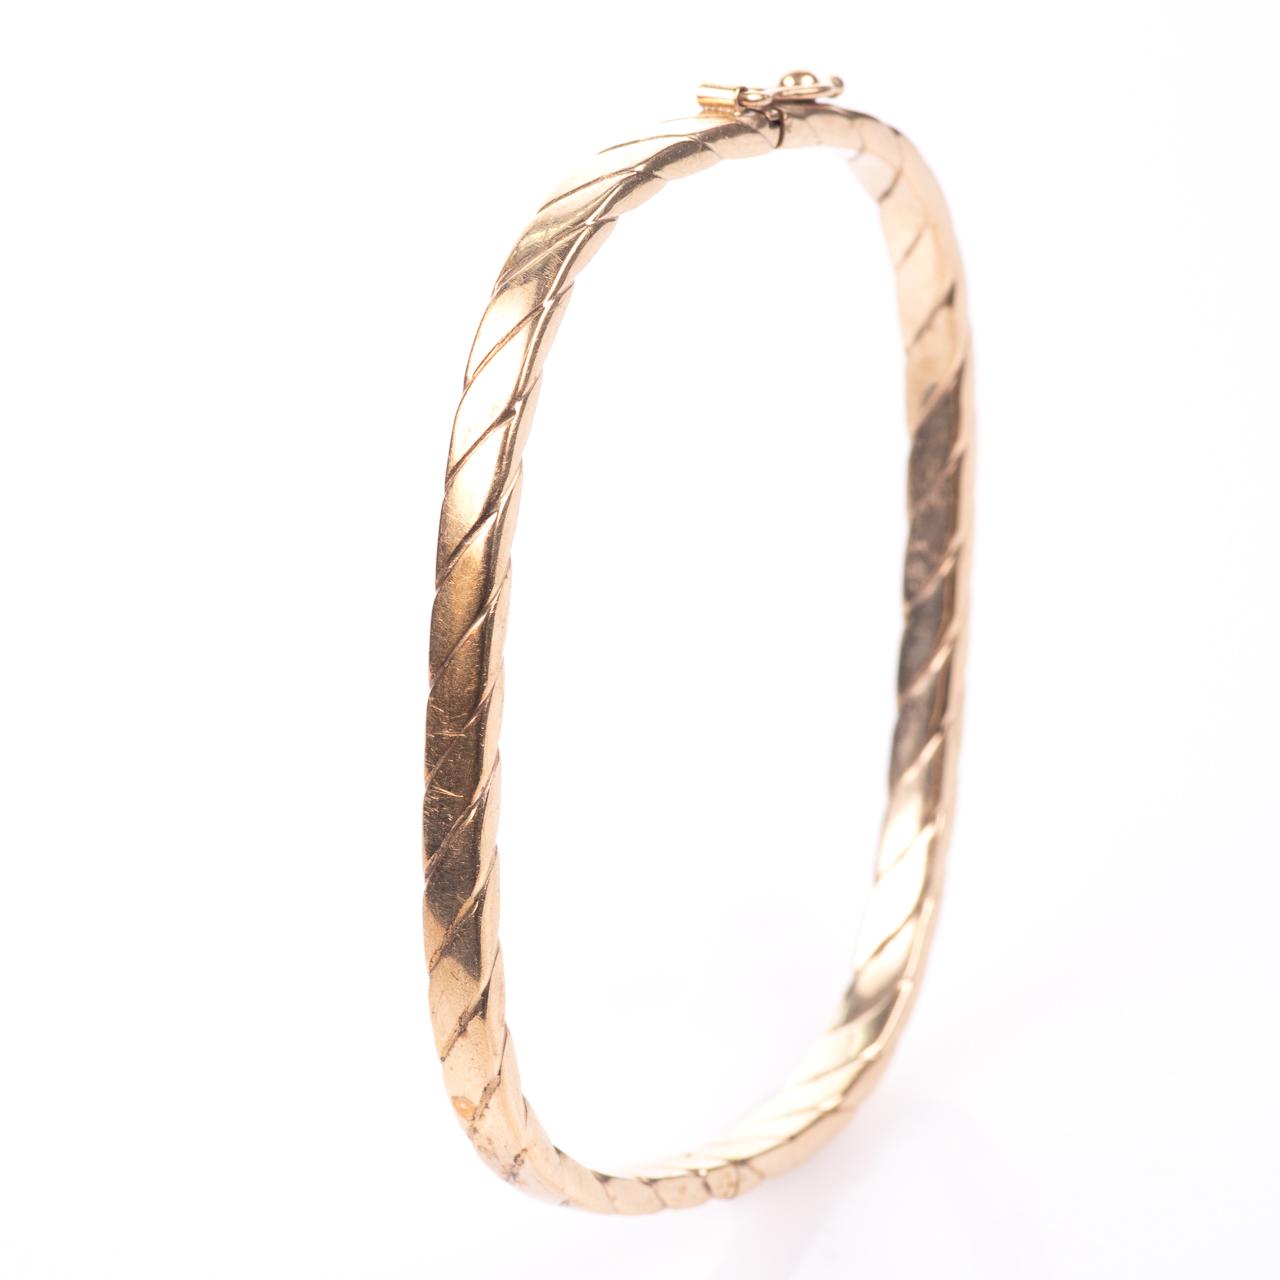 9ct Gold Bangle Bracelet